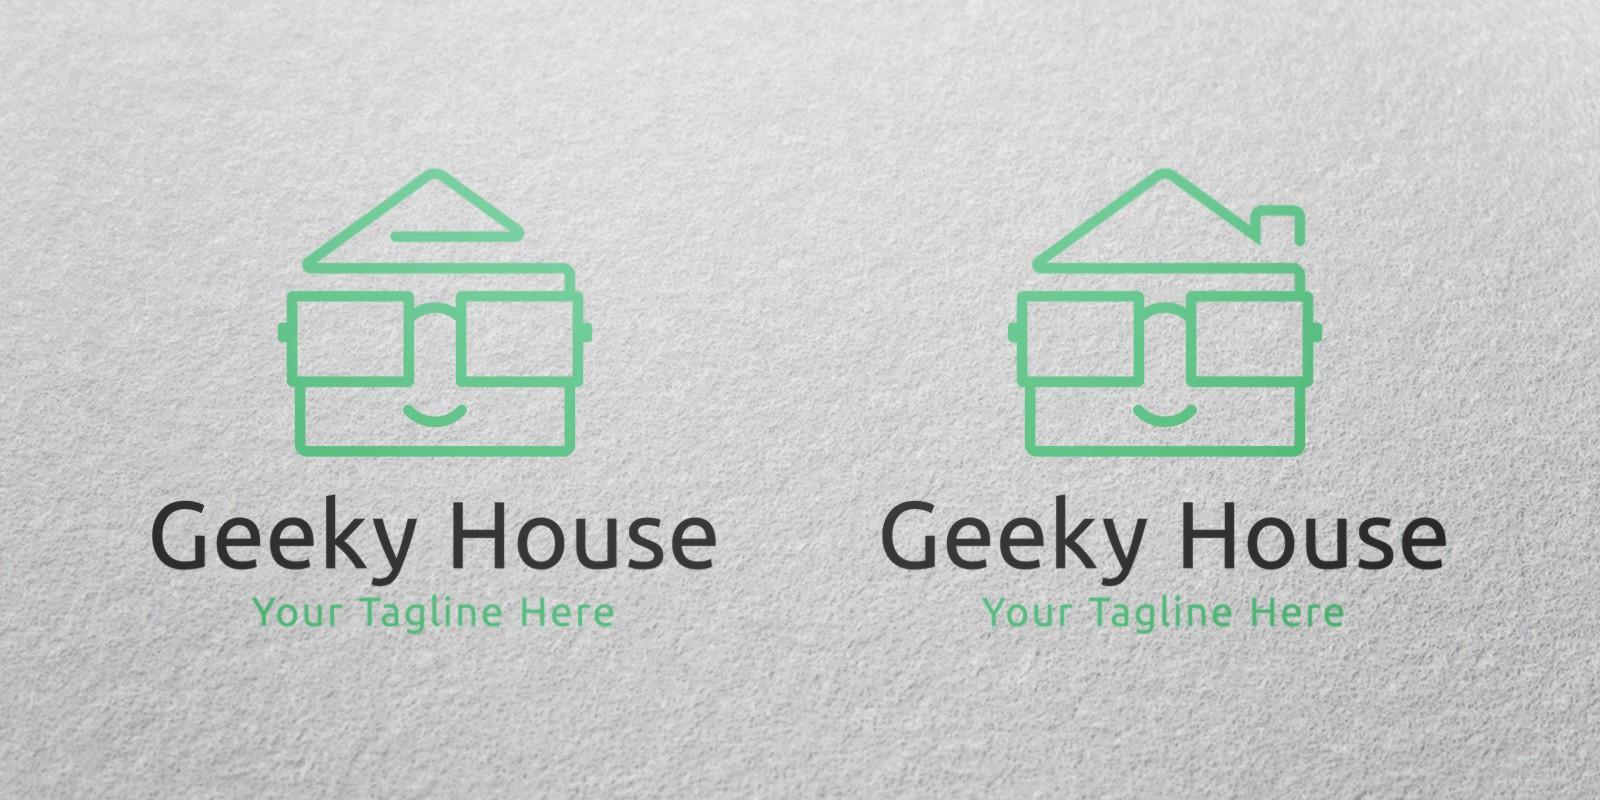 Geeky House Logo Template - Building Logo Templates | Codester